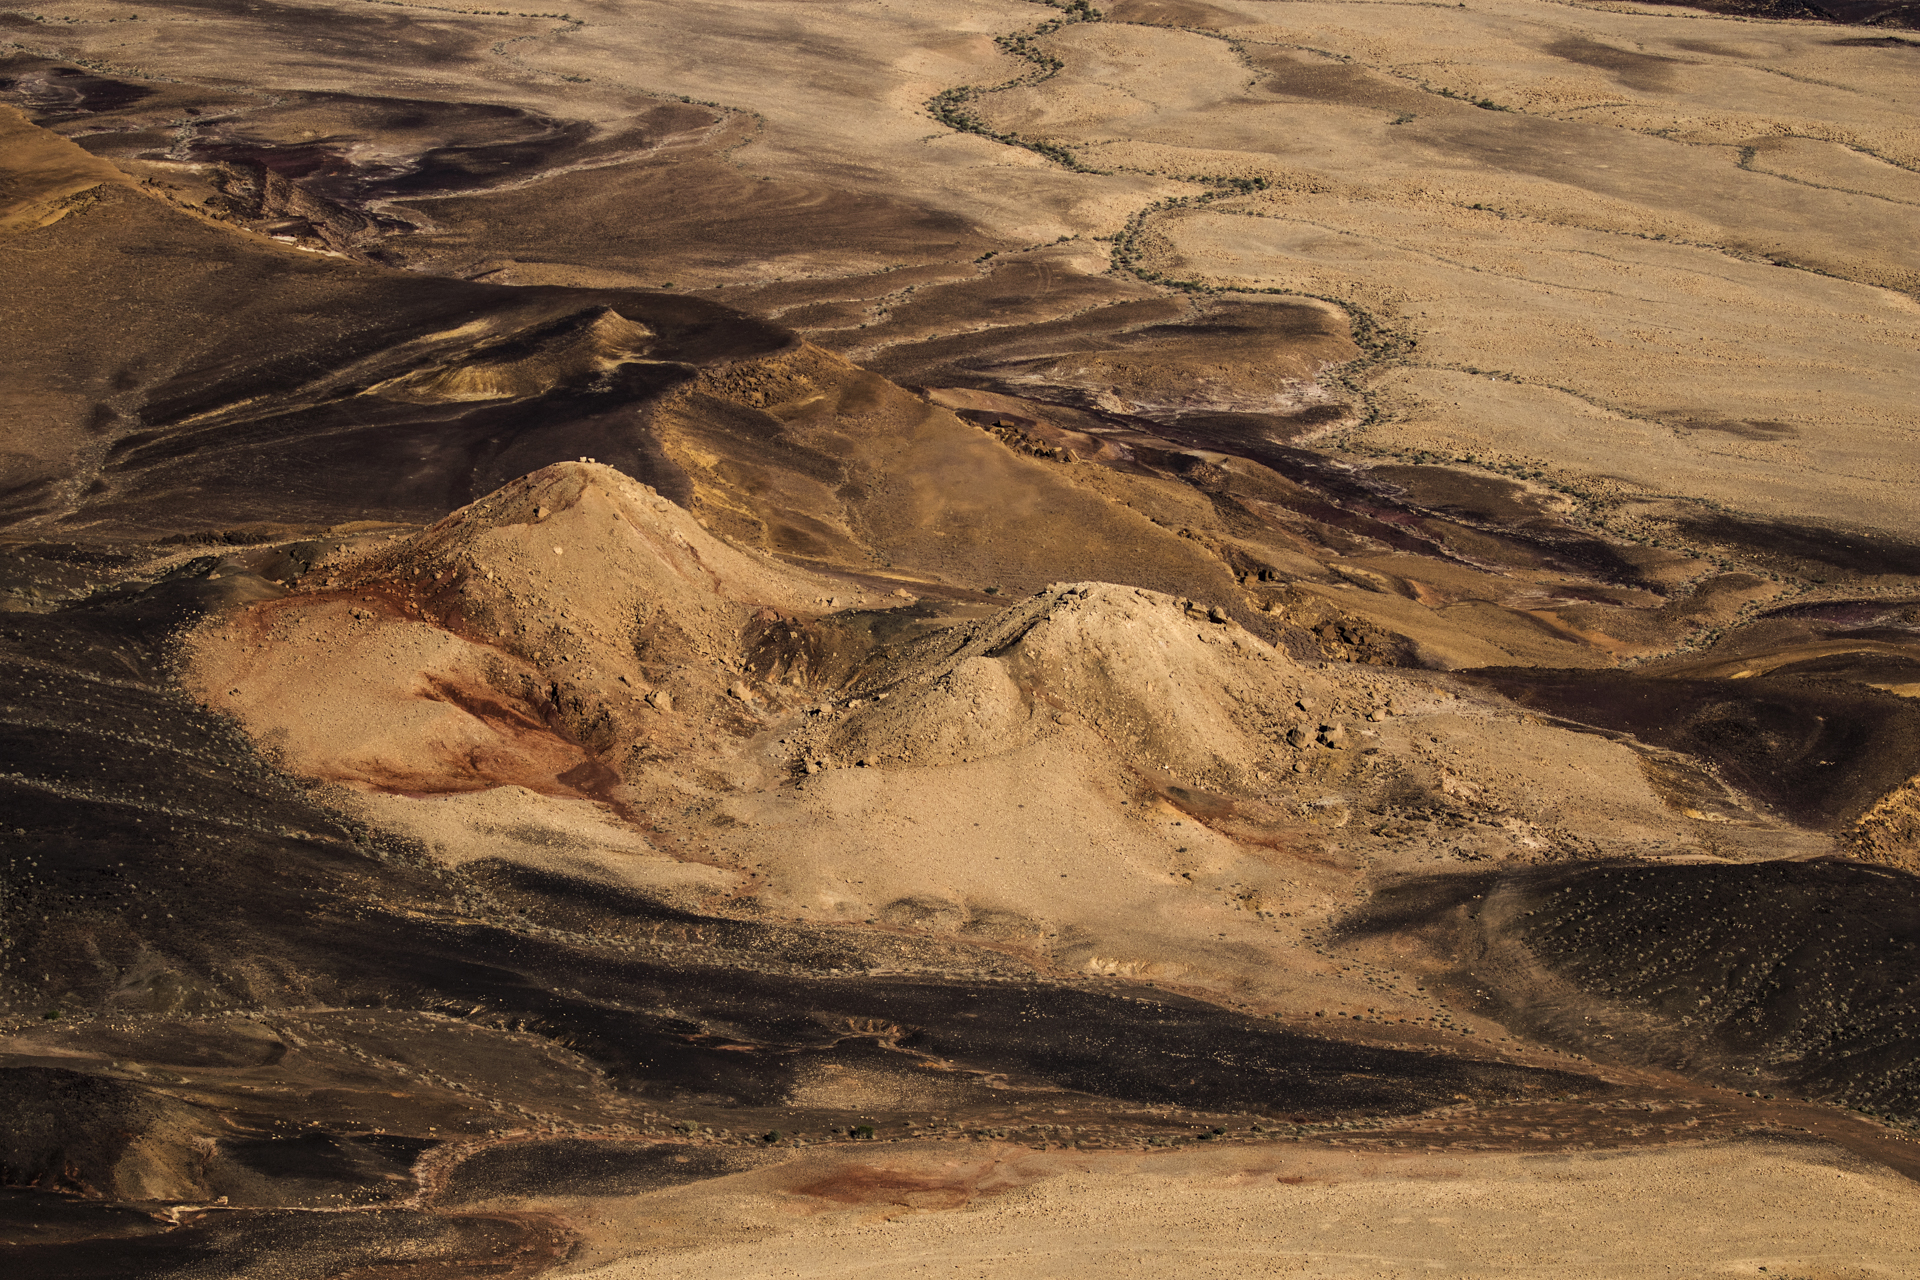 Ramon Crater wpy.jpg